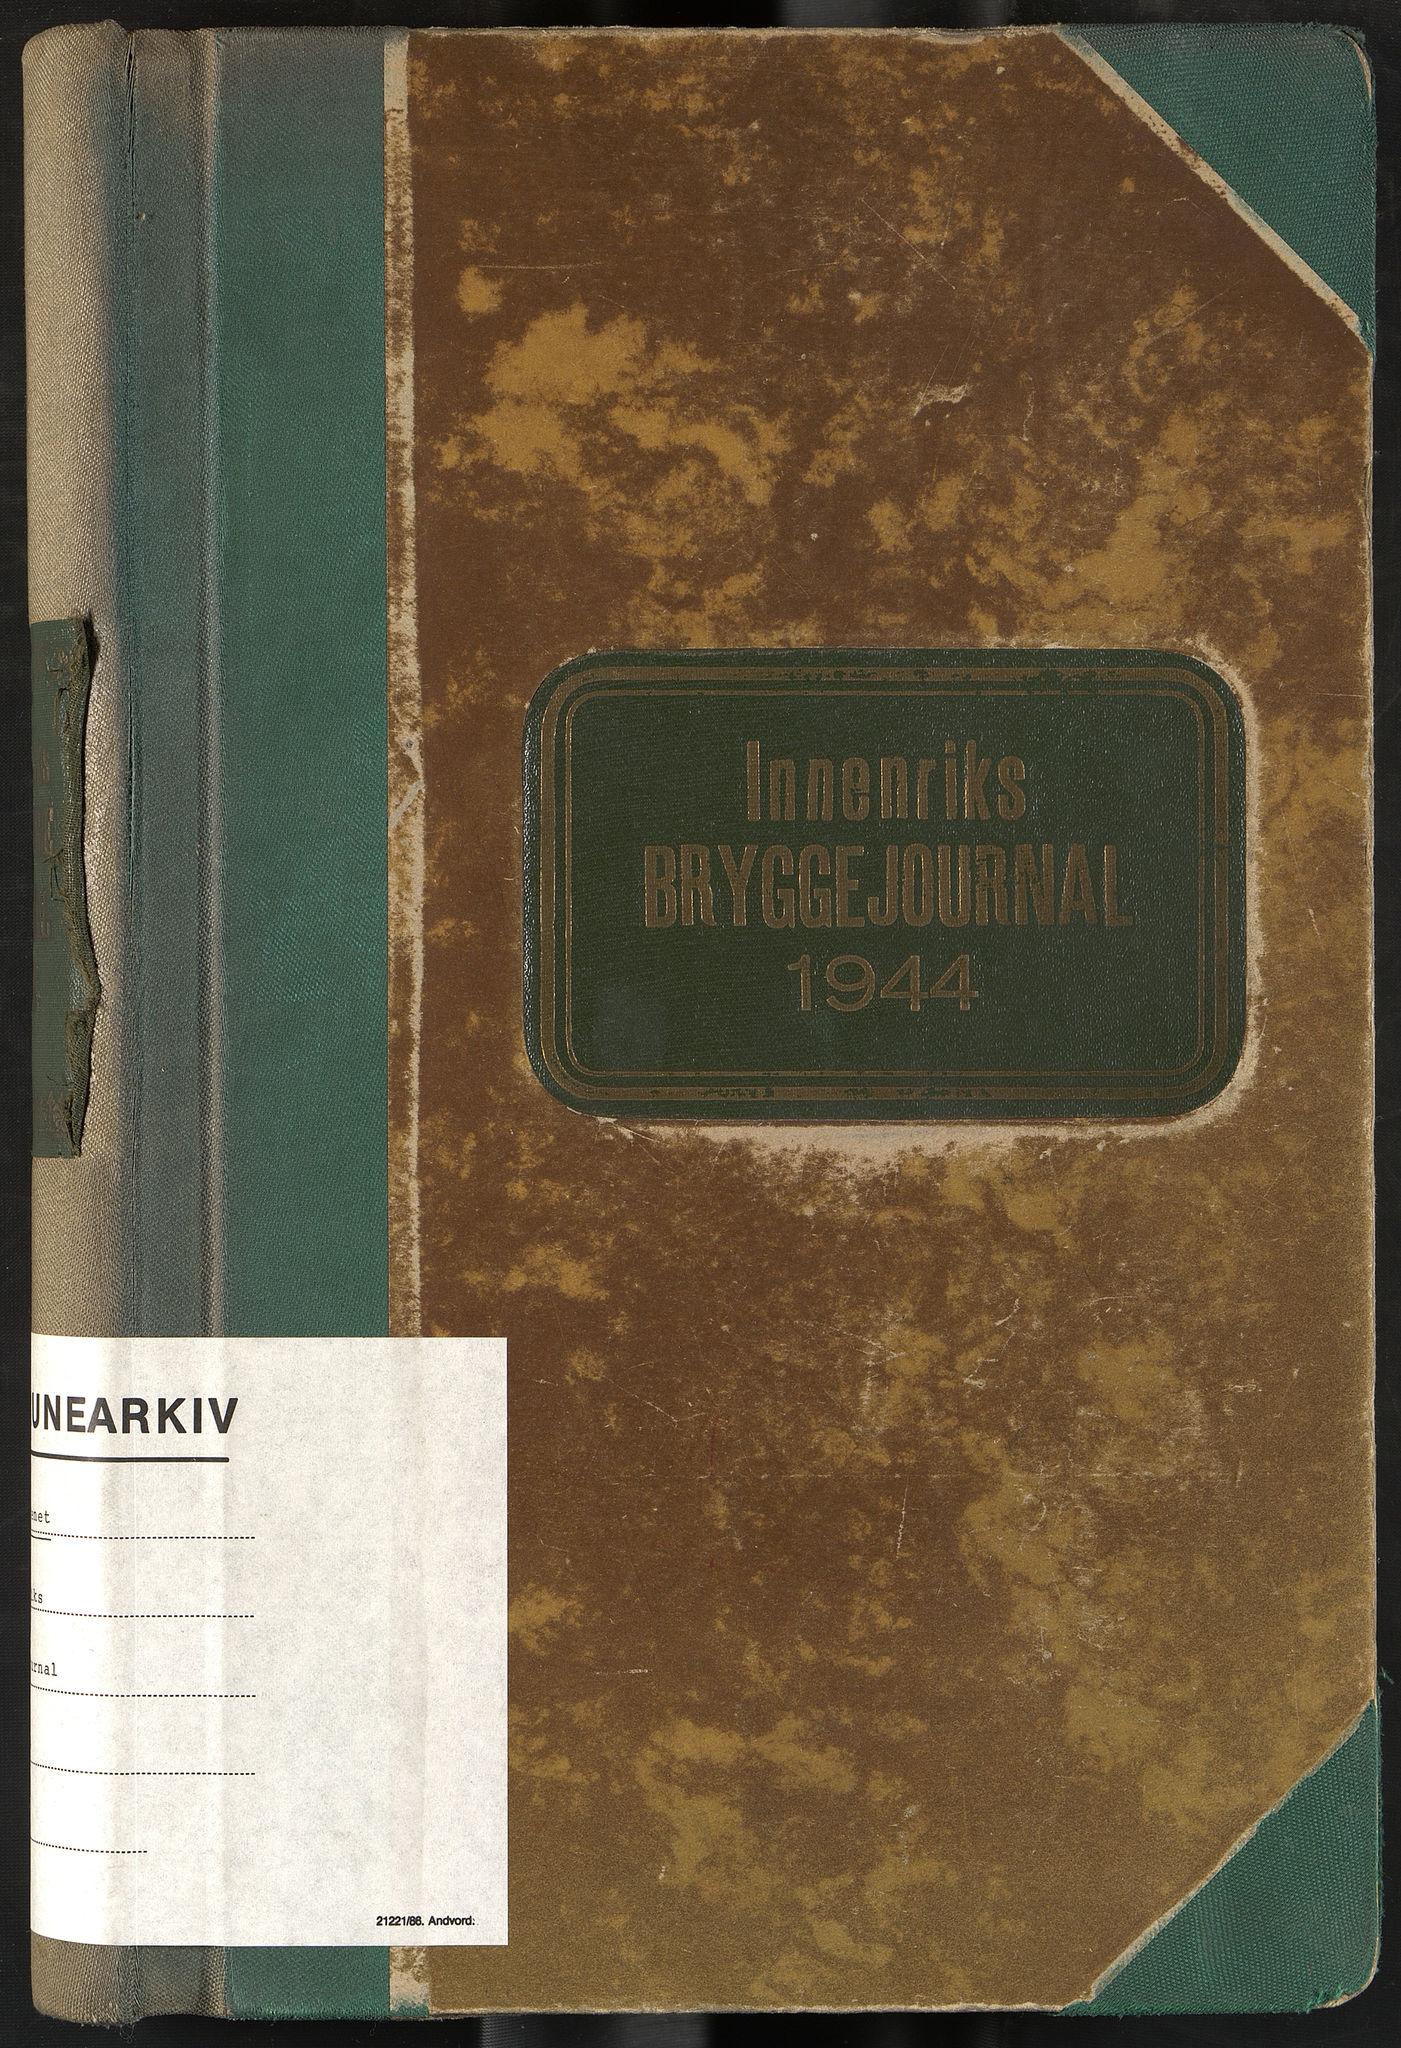 OBA, Oslo havnevesen, Fa/Fad/L0056: Innenriks bryggejournal, 1944